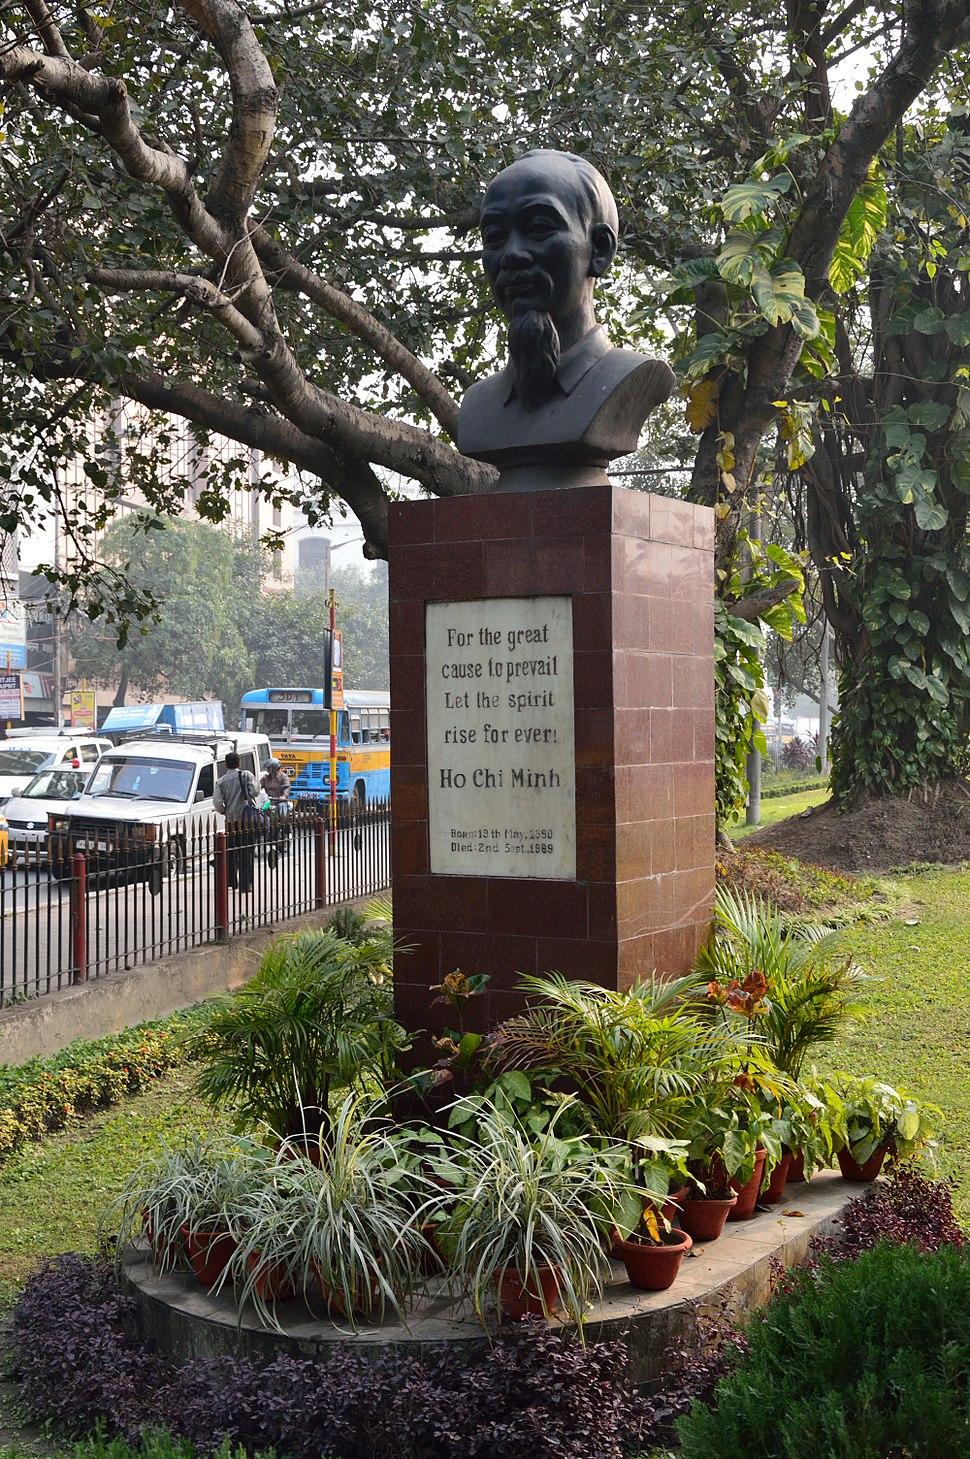 Ho Chi Minh - Bust - Chowringhee Road - Kolkata 2013-01-05 2465